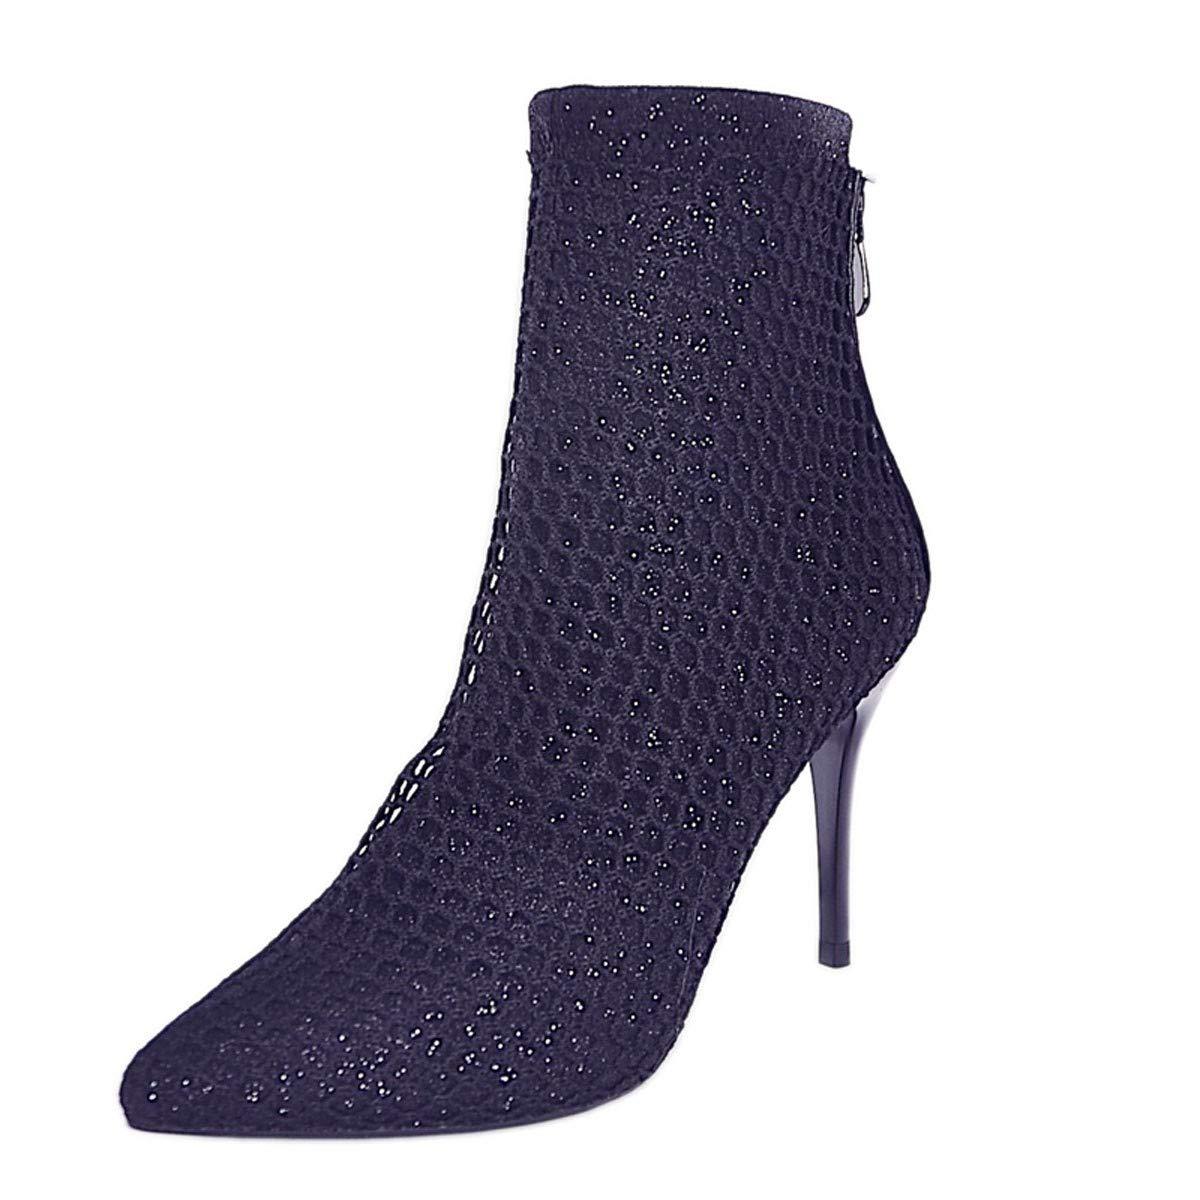 GTVERNH Frauen Schuhe/Mode Mesh Hohl Sexy Kurze Stiefel Slim - Heels 9Cm High Heels Spitze Mode - Stiefel Damenschuhe